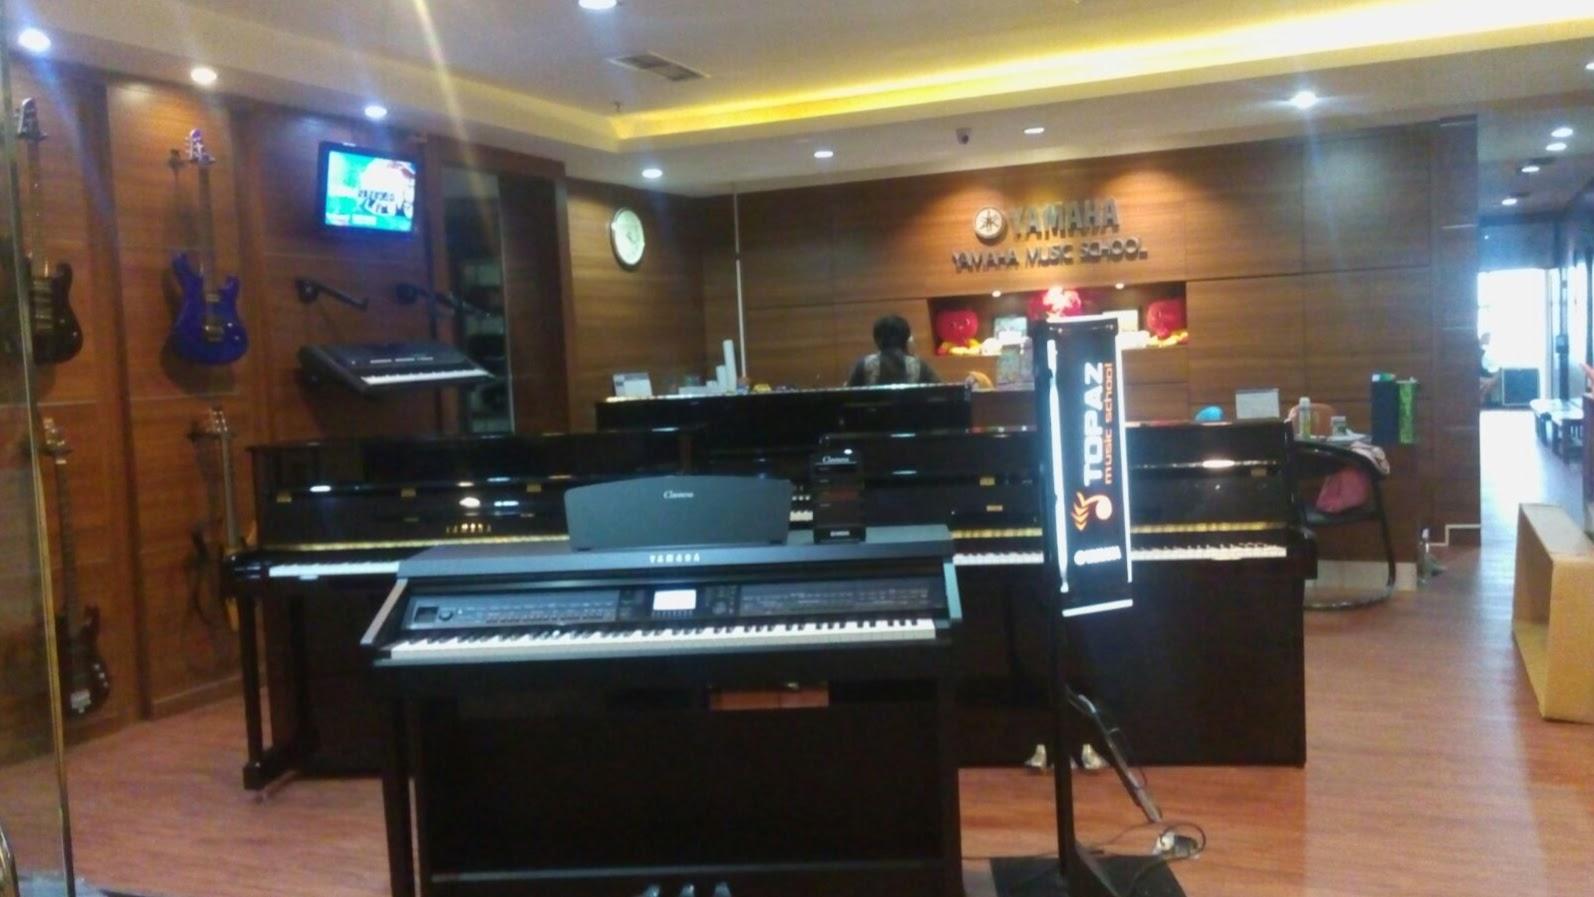 jual baru yamaha digital piano segel garansi 1 tahun dijual cvp 701b yamaha digital piano. Black Bedroom Furniture Sets. Home Design Ideas